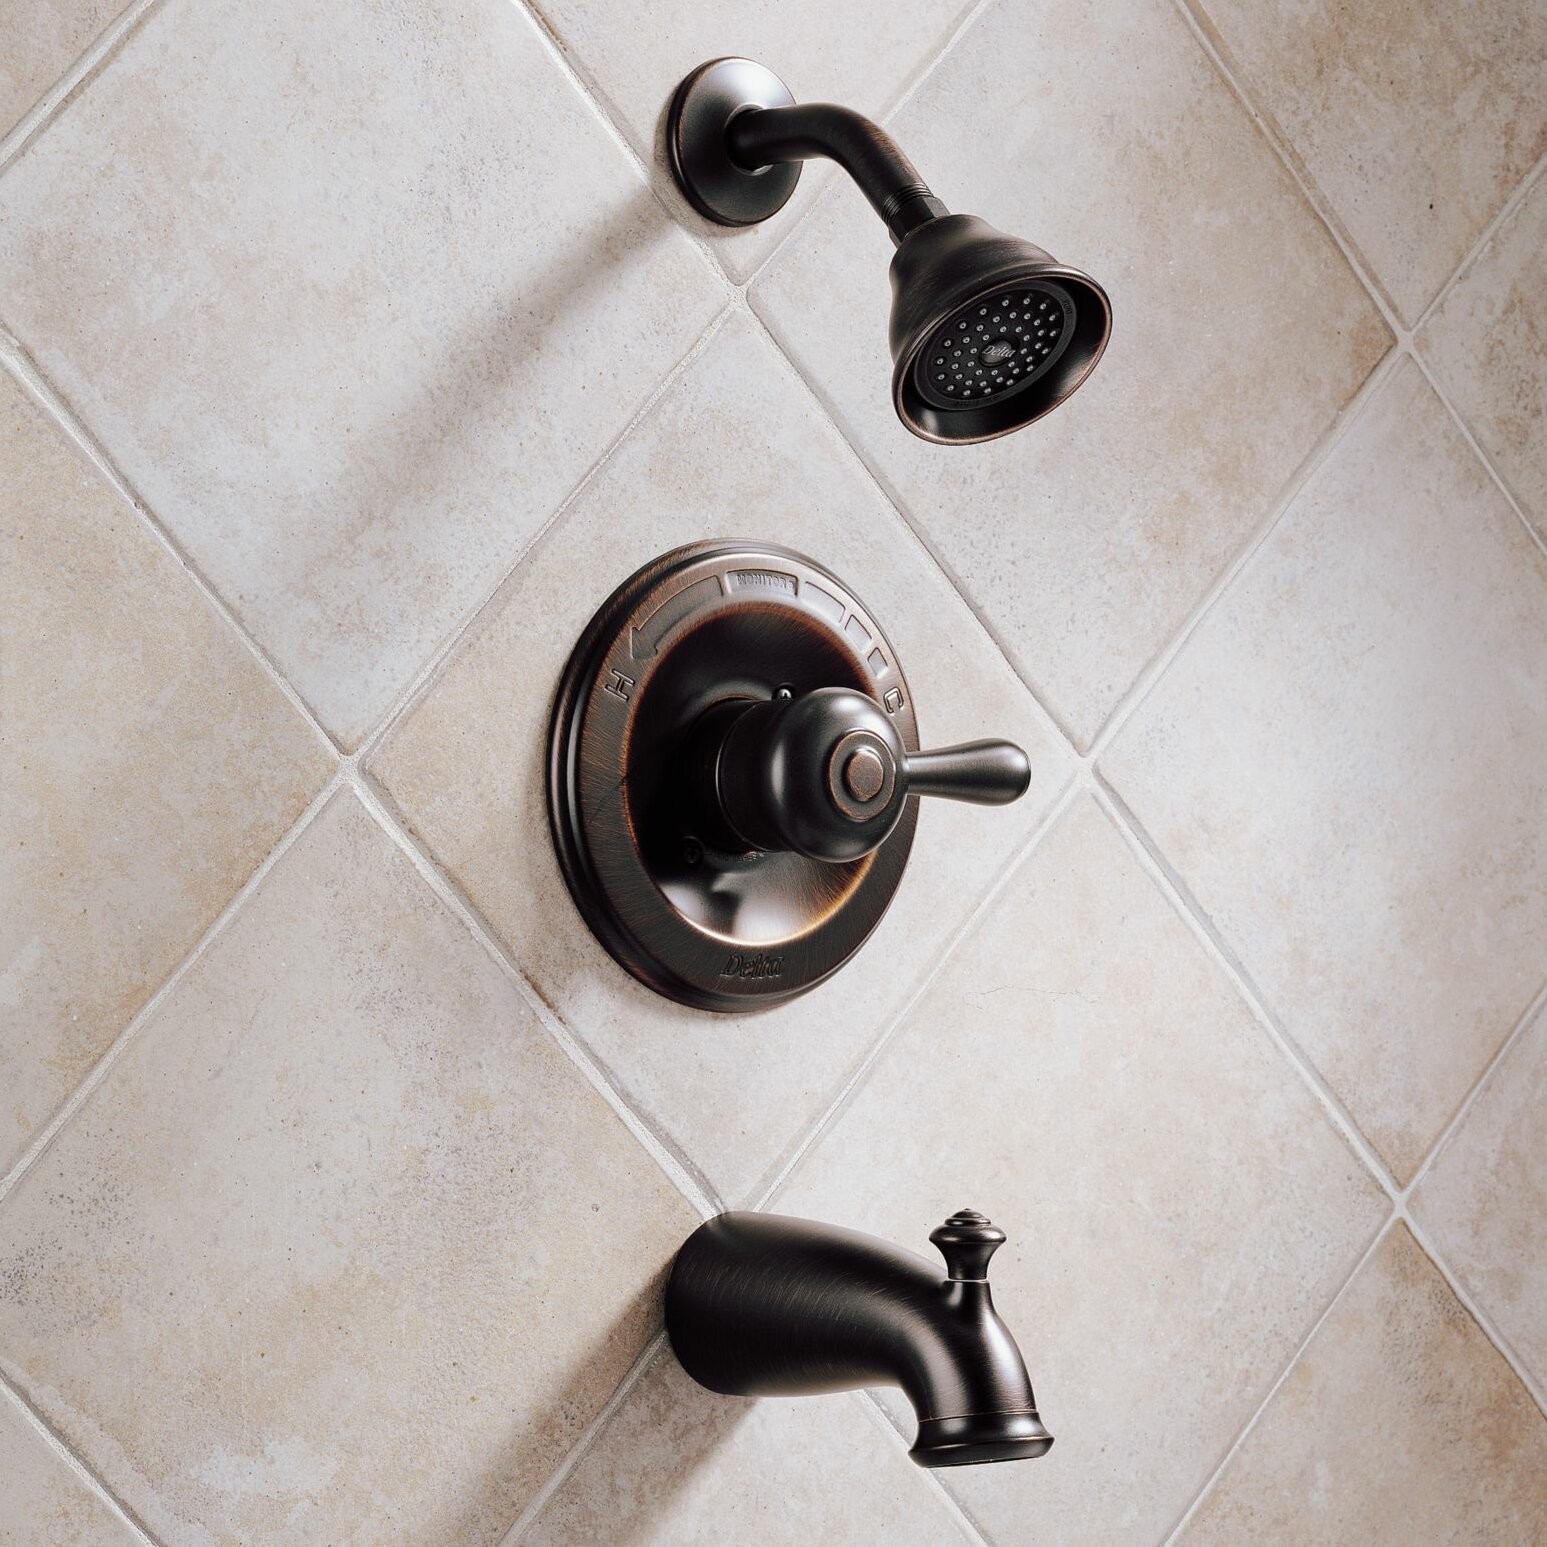 Delta Leland Pressure Balanced Diverter Tub And Shower Faucet Trim Reviews Wayfair